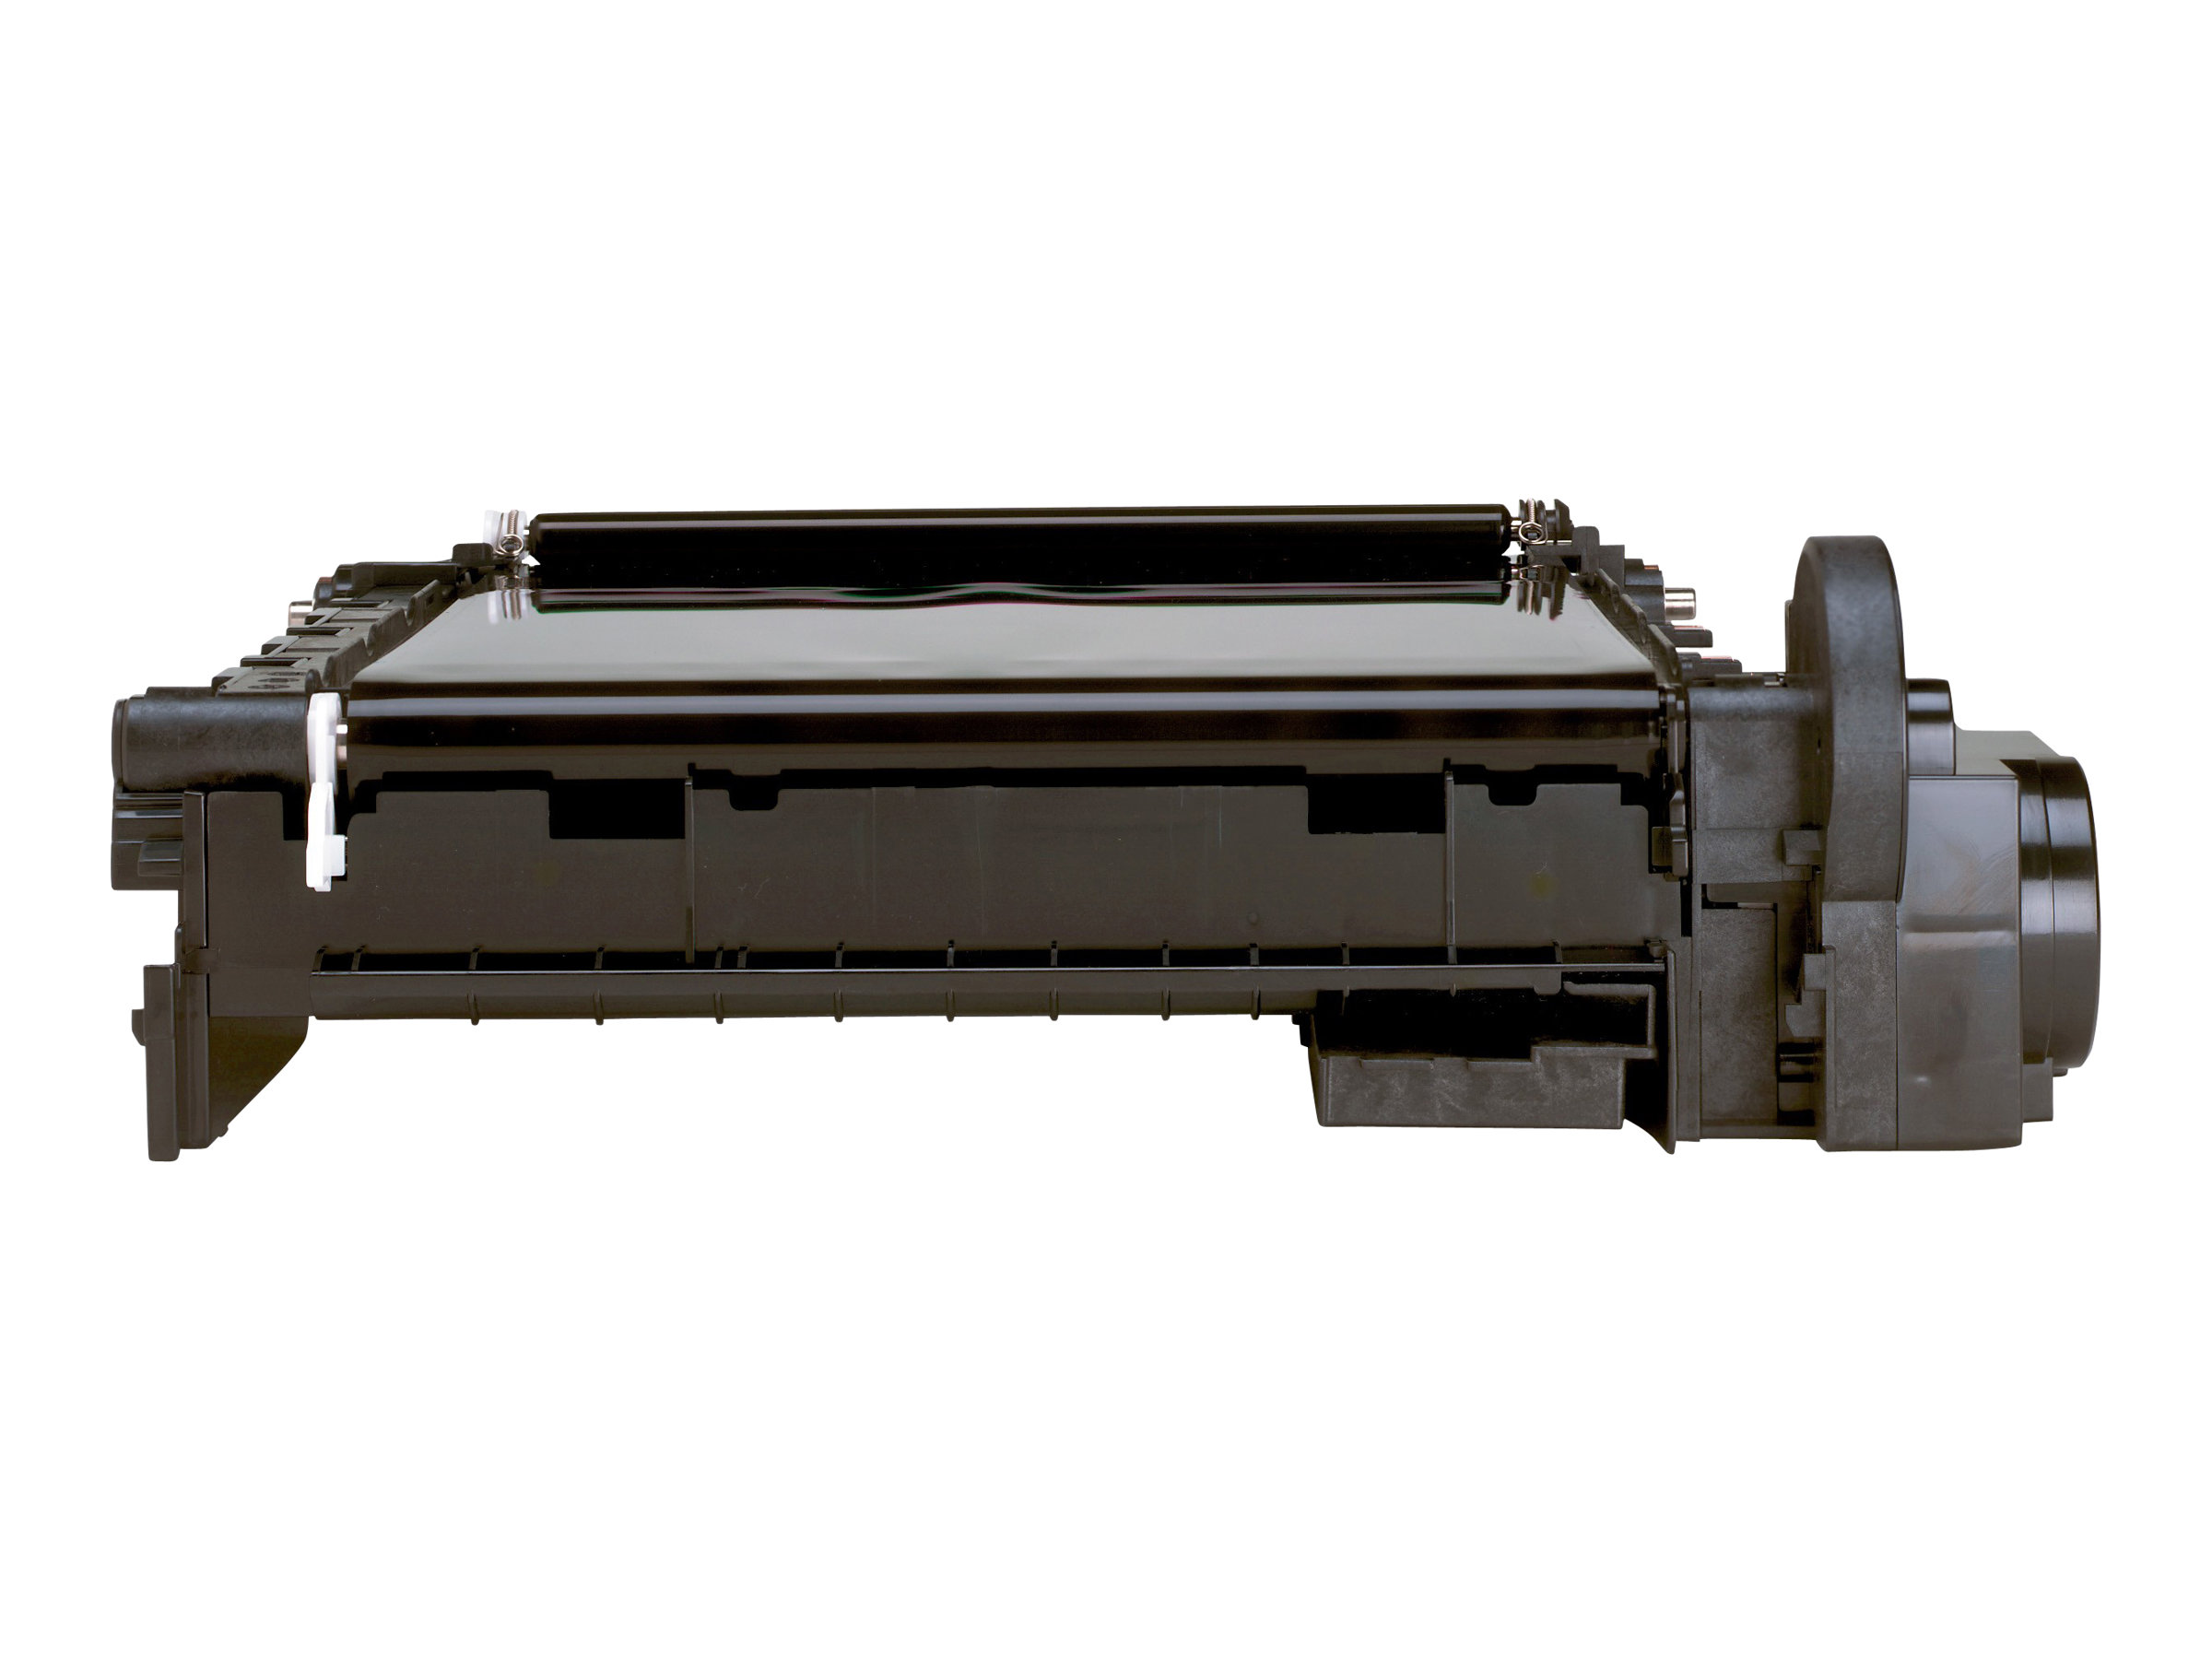 HP - Drucker - Transfer Kit - für Color LaserJet 4650, 4650dn, 4650dtn, 4650hdn, 4650n